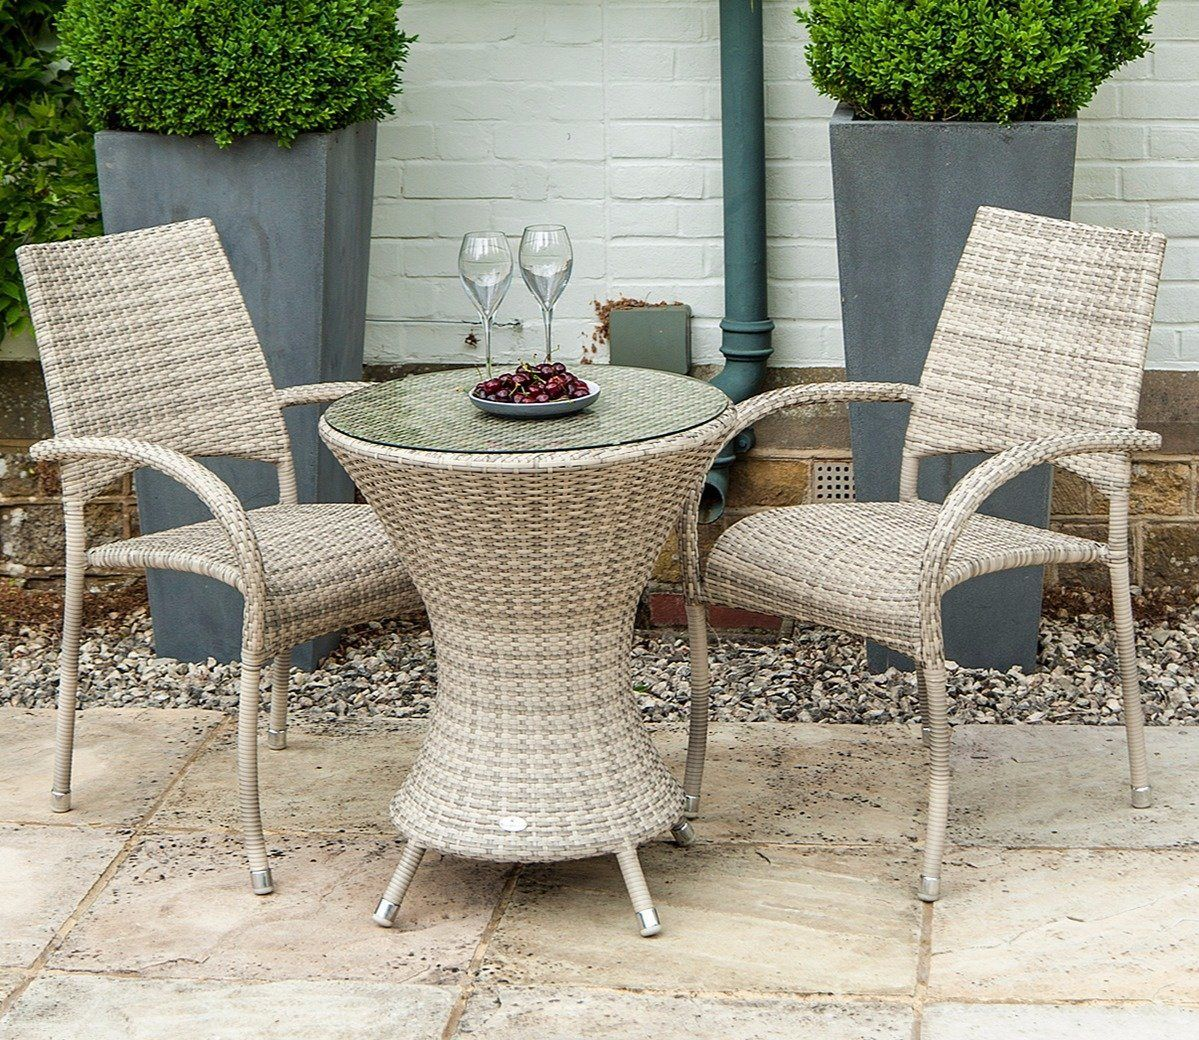 Alexander Rose Ocean Pearl 2 Seater Dining Set Patio Furniture Sets Outdoor Patio Furniture Sets Bistro Furniture